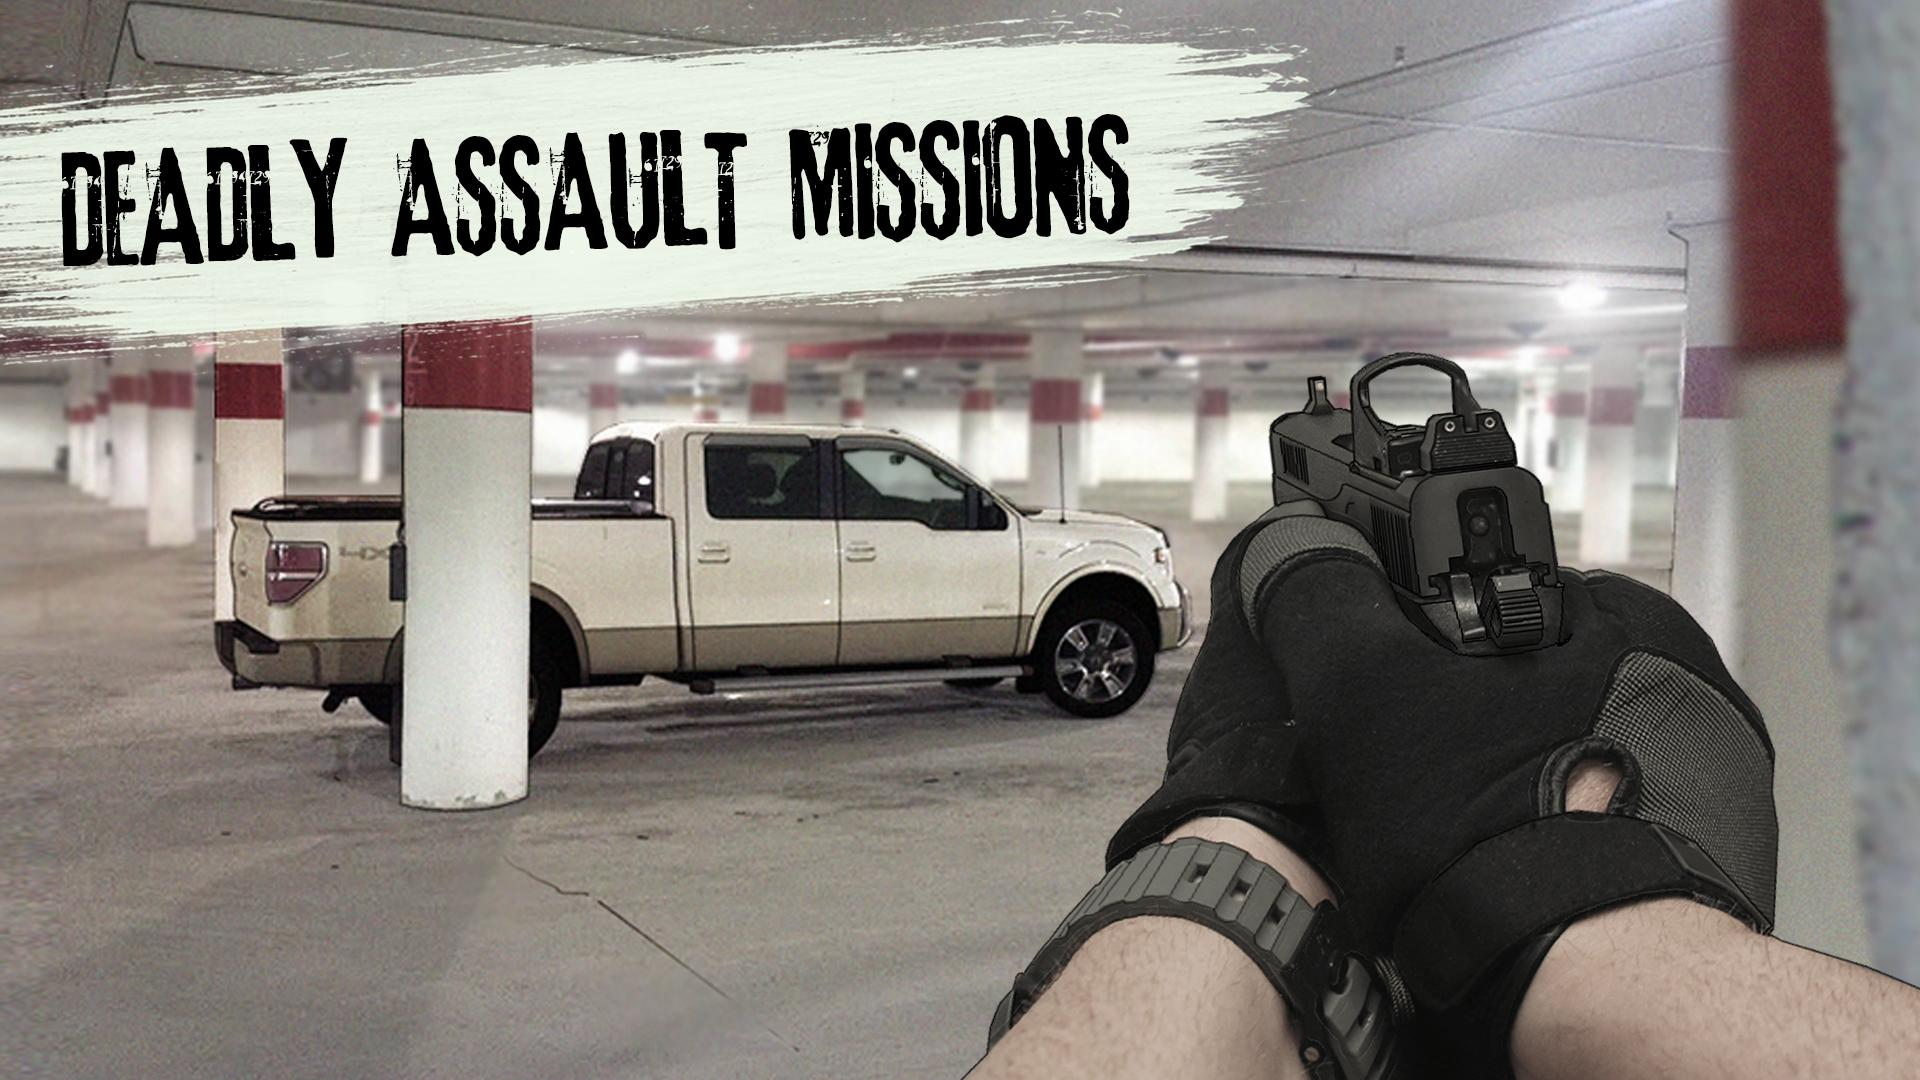 LONEWOLF (17+) - a Sniper Story 1.2.95 Screenshot 17